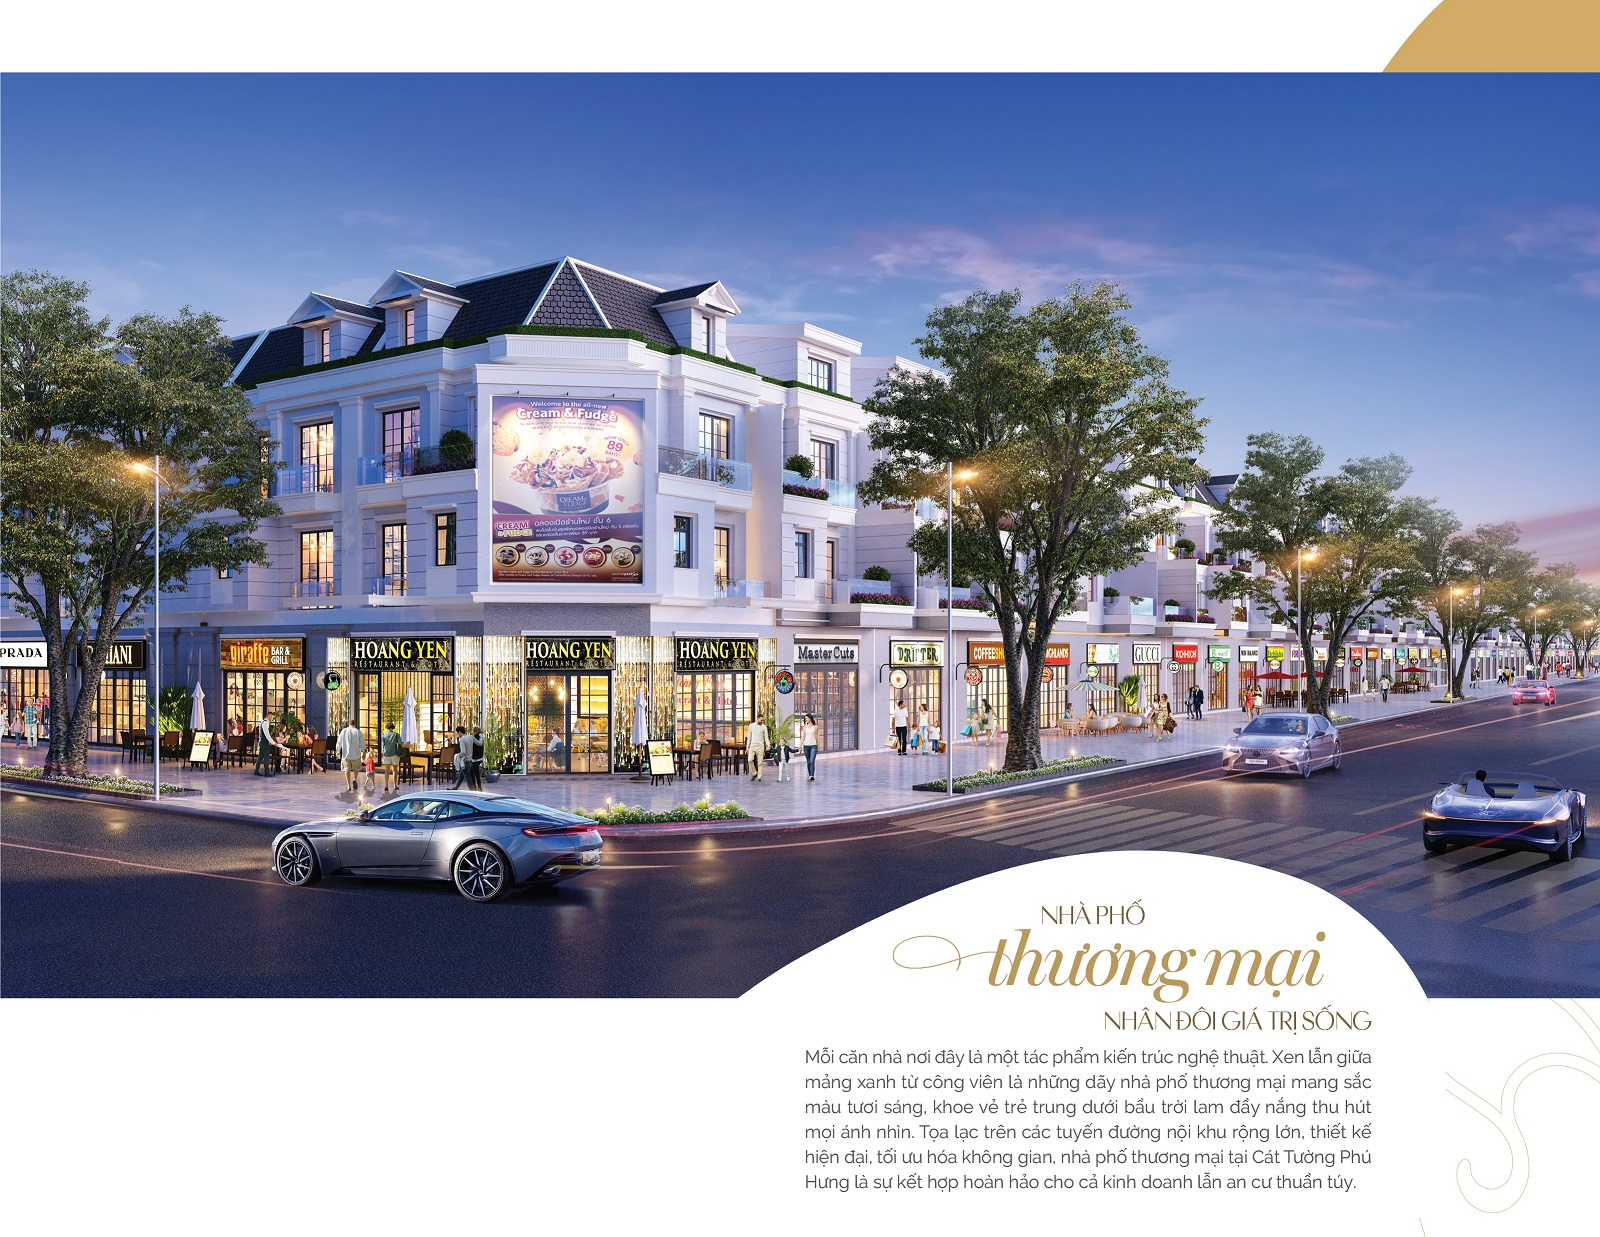 Shophouse-du-an-thanh-long-bay-8x20